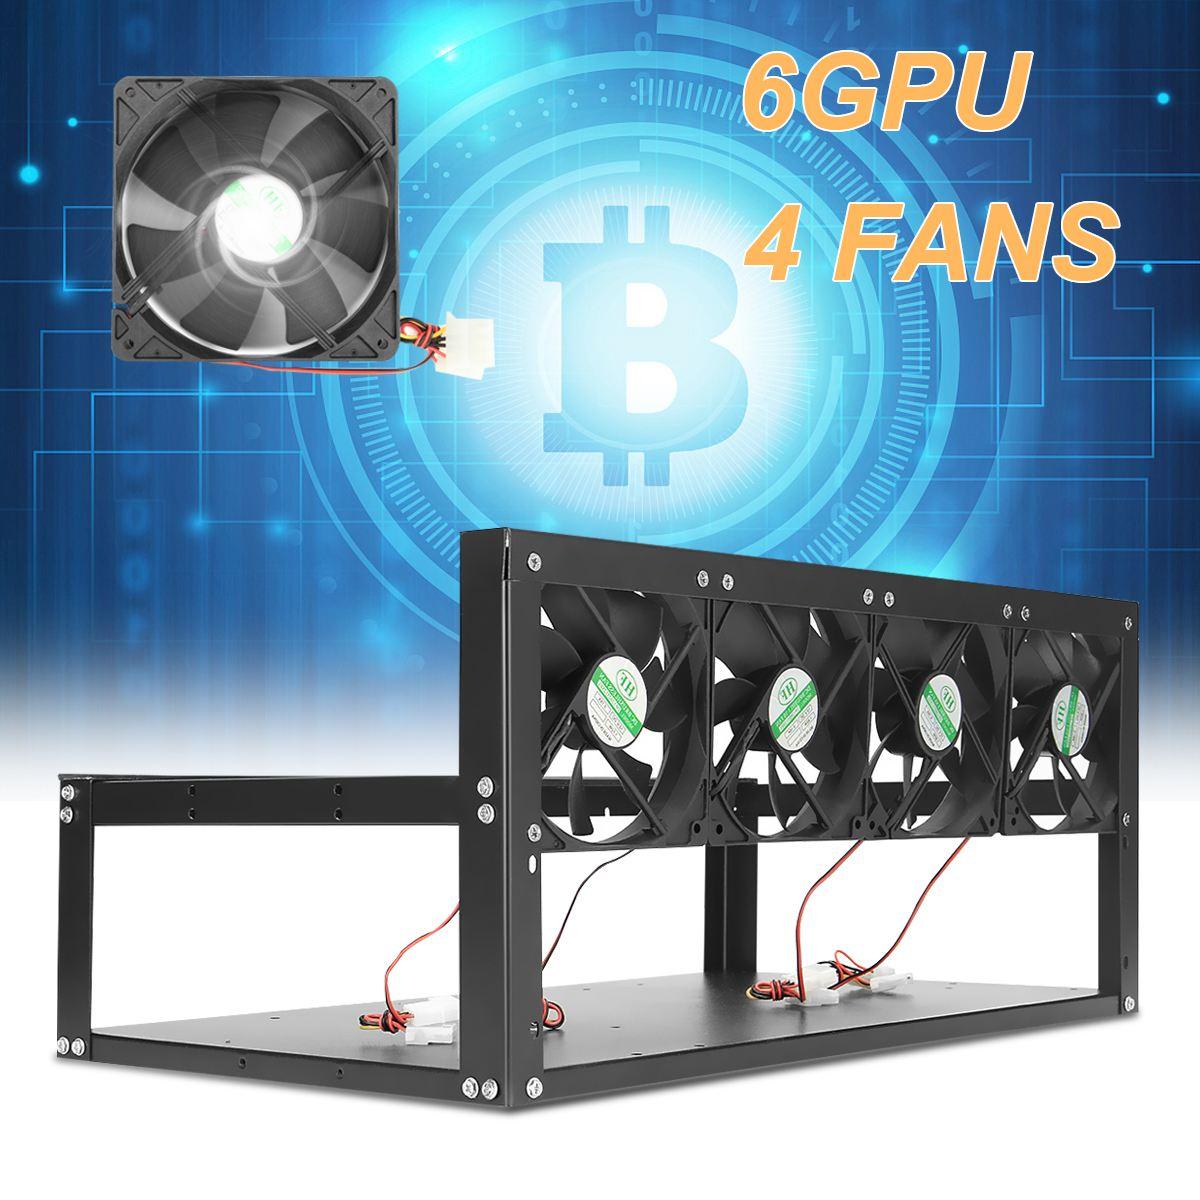 6 GPU 4 Fans Open Air Pro Mining Computer Alloy Case Frame Rig 4 for 6 GPU ETH BTC ZEC Ethereum